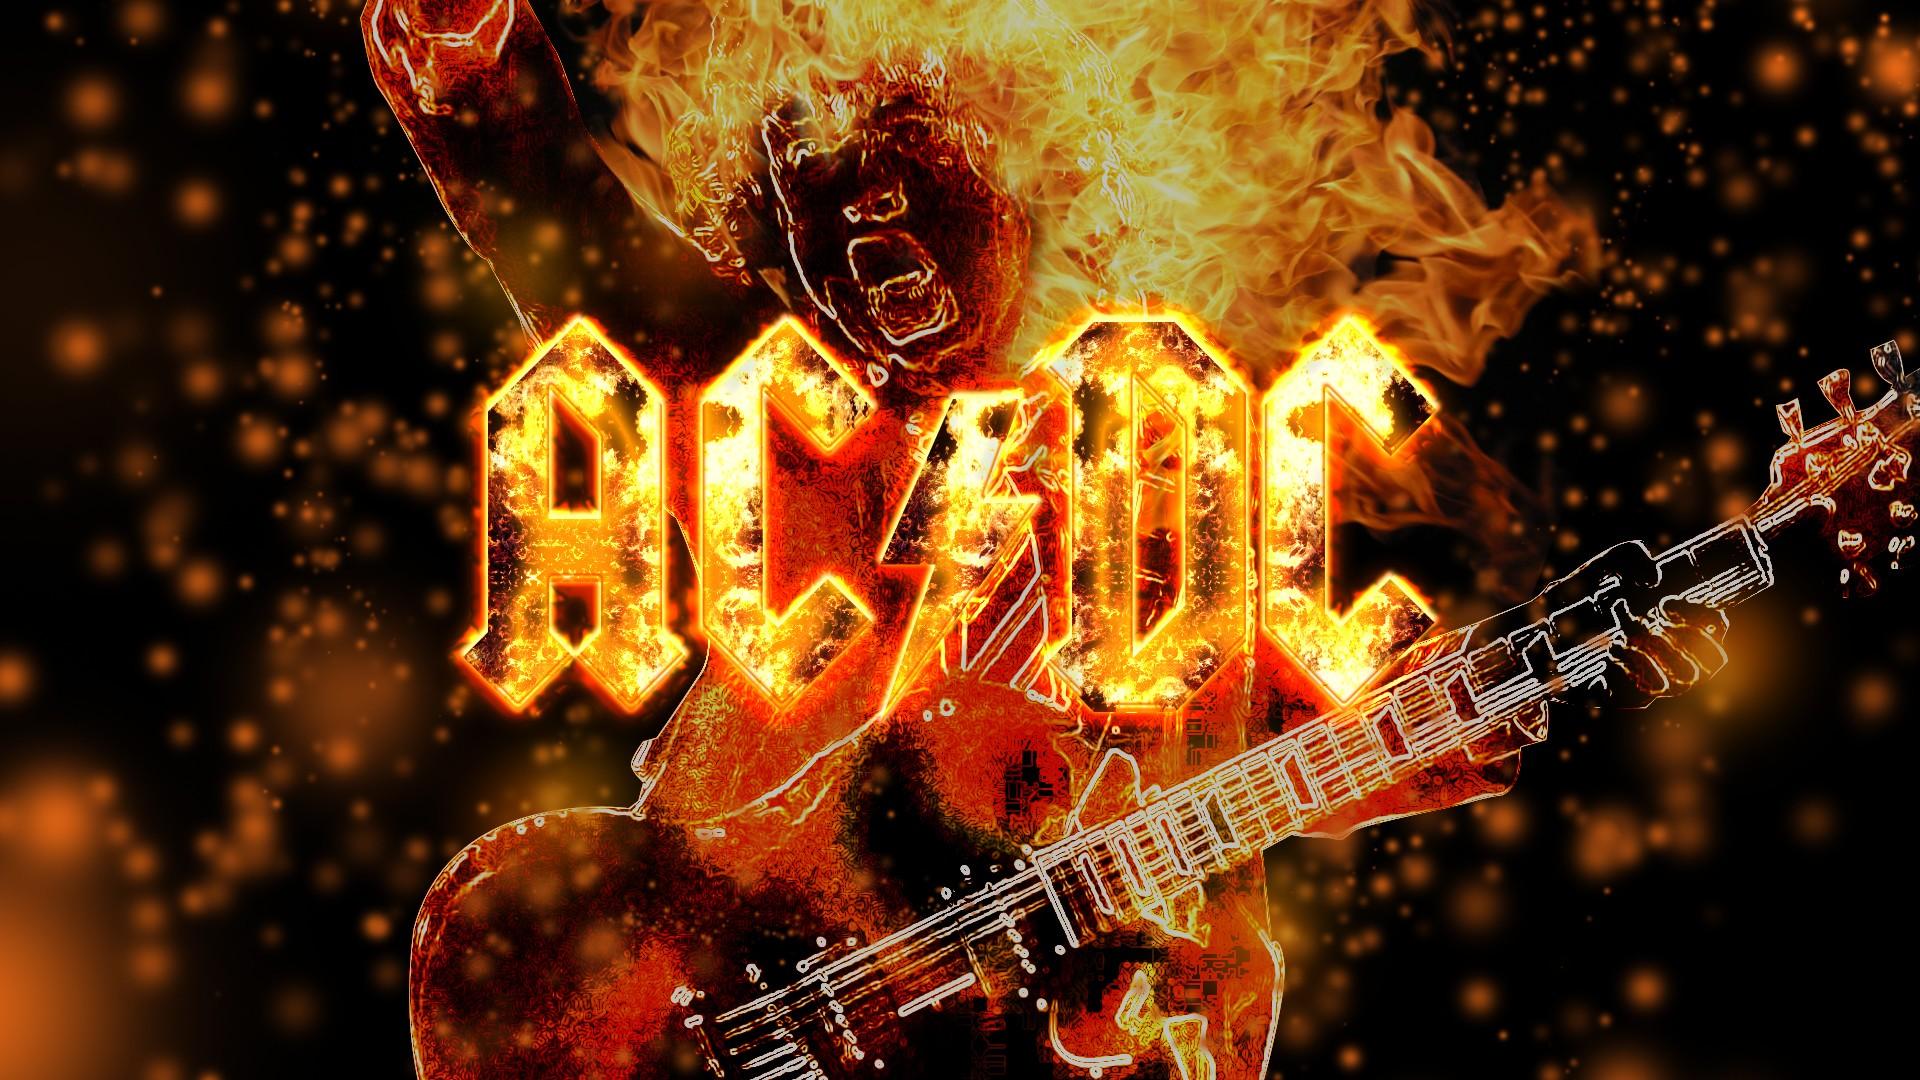 AC/DC乐队火焰效果壁纸